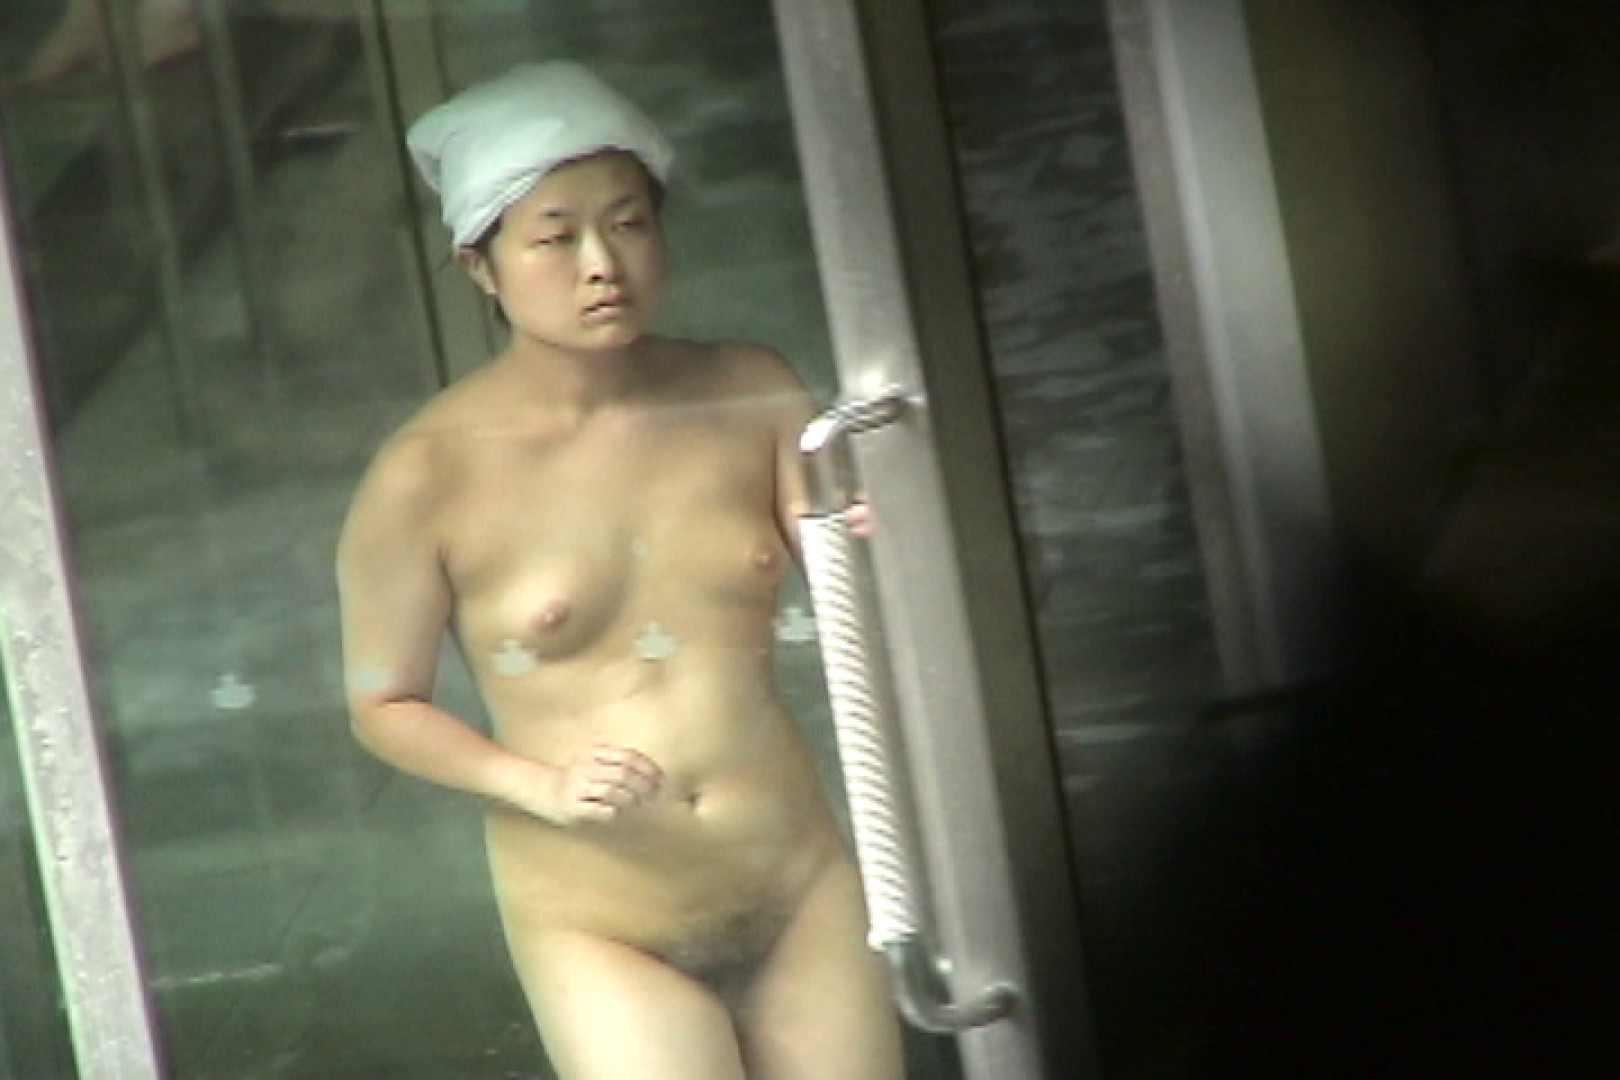 Aquaな露天風呂Vol.449 盗撮 | HなOL  101pic 48